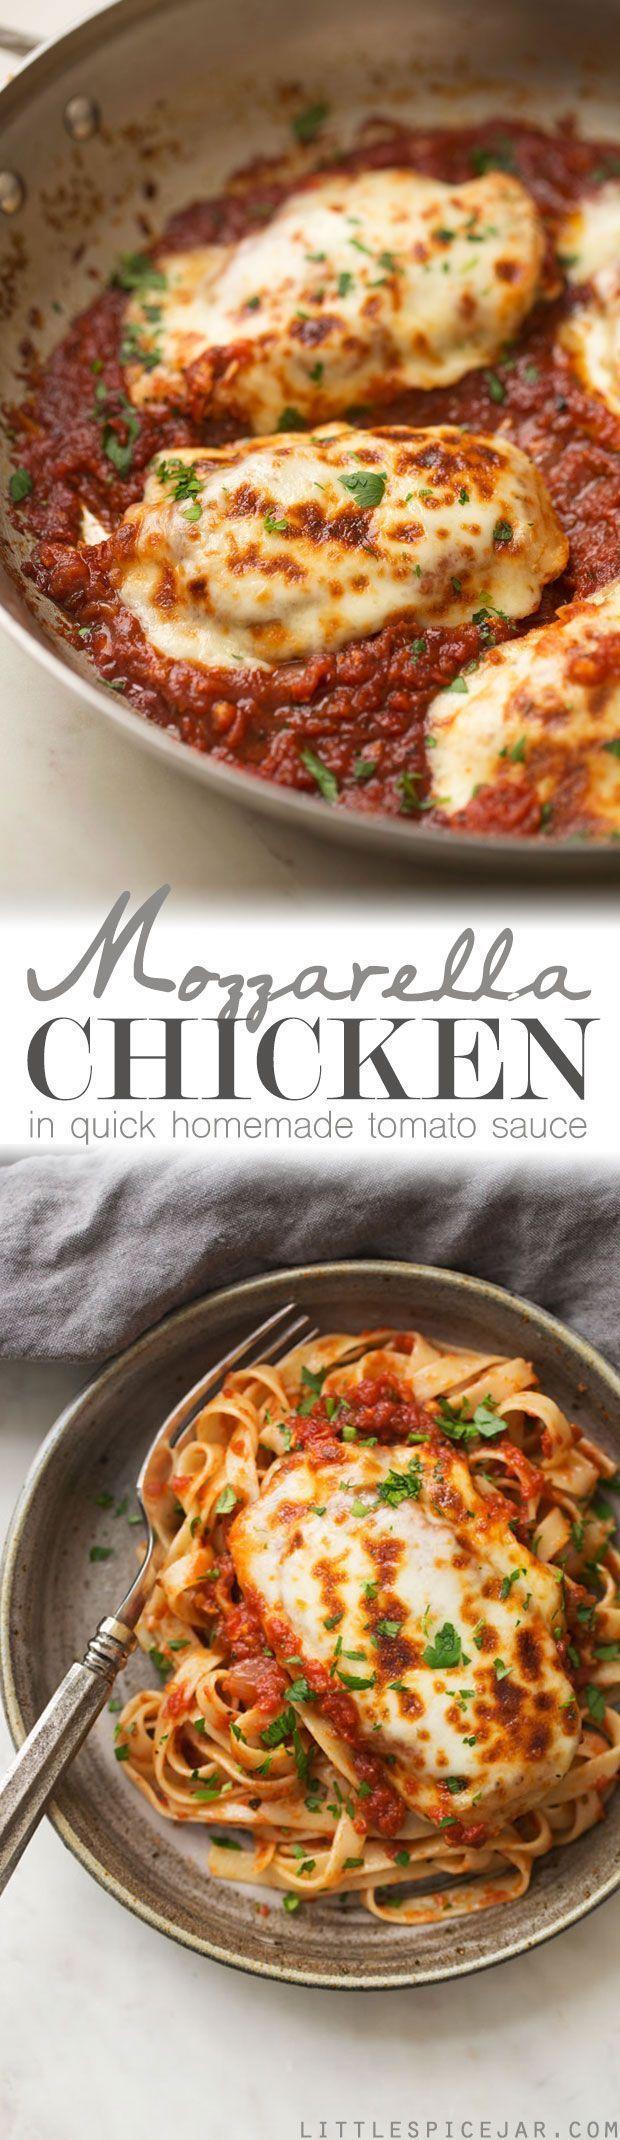 30 Minute Mozzarella Chicken in Tomato Sauce - a quick and easy weeknight recipe for chicken smothered in tomato sauce with melty mozzarella! Serve with bread or pasta!